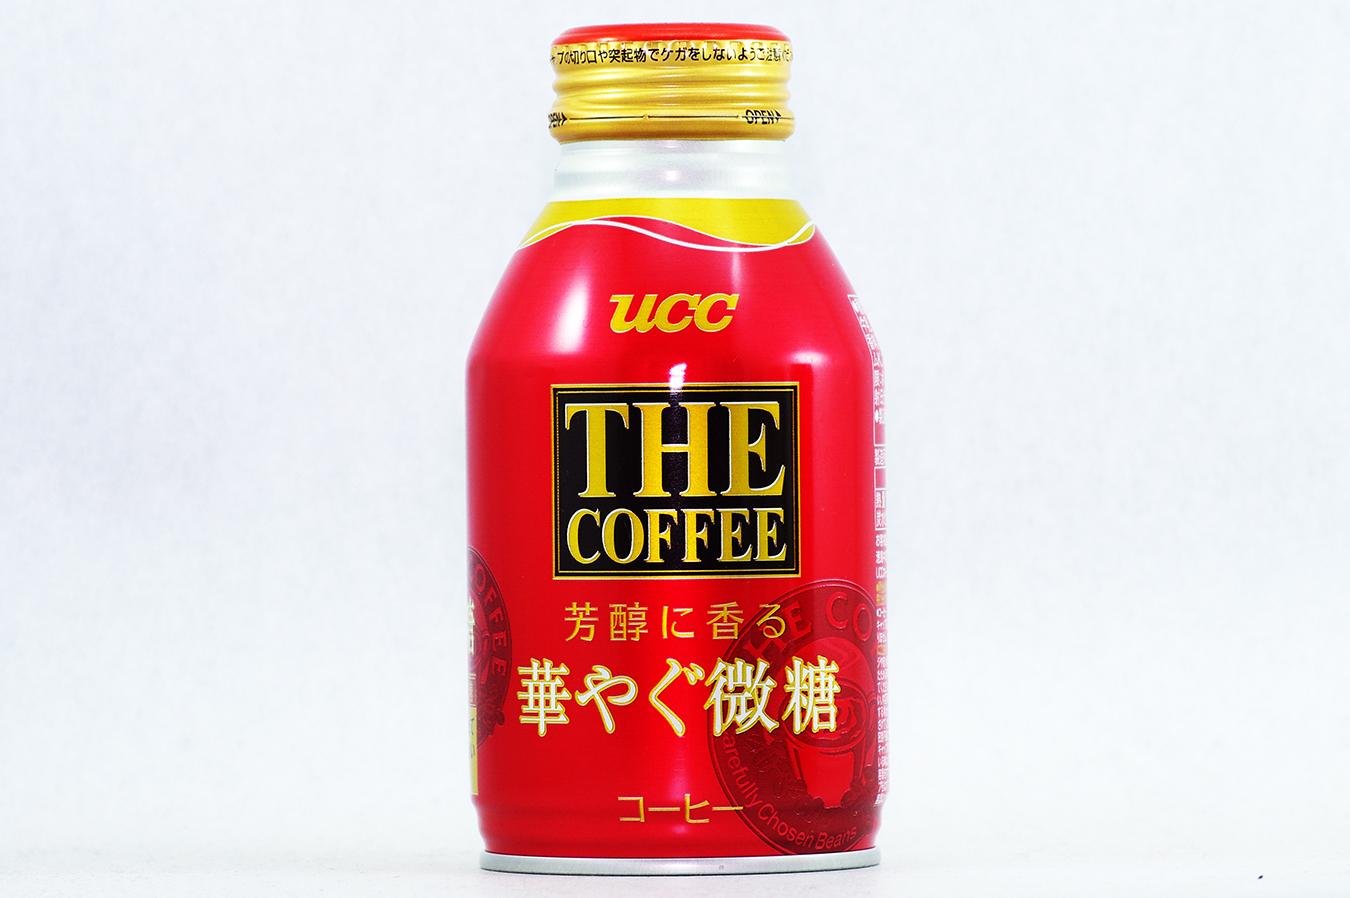 UCC THE COFFEE 華やぐ微糖